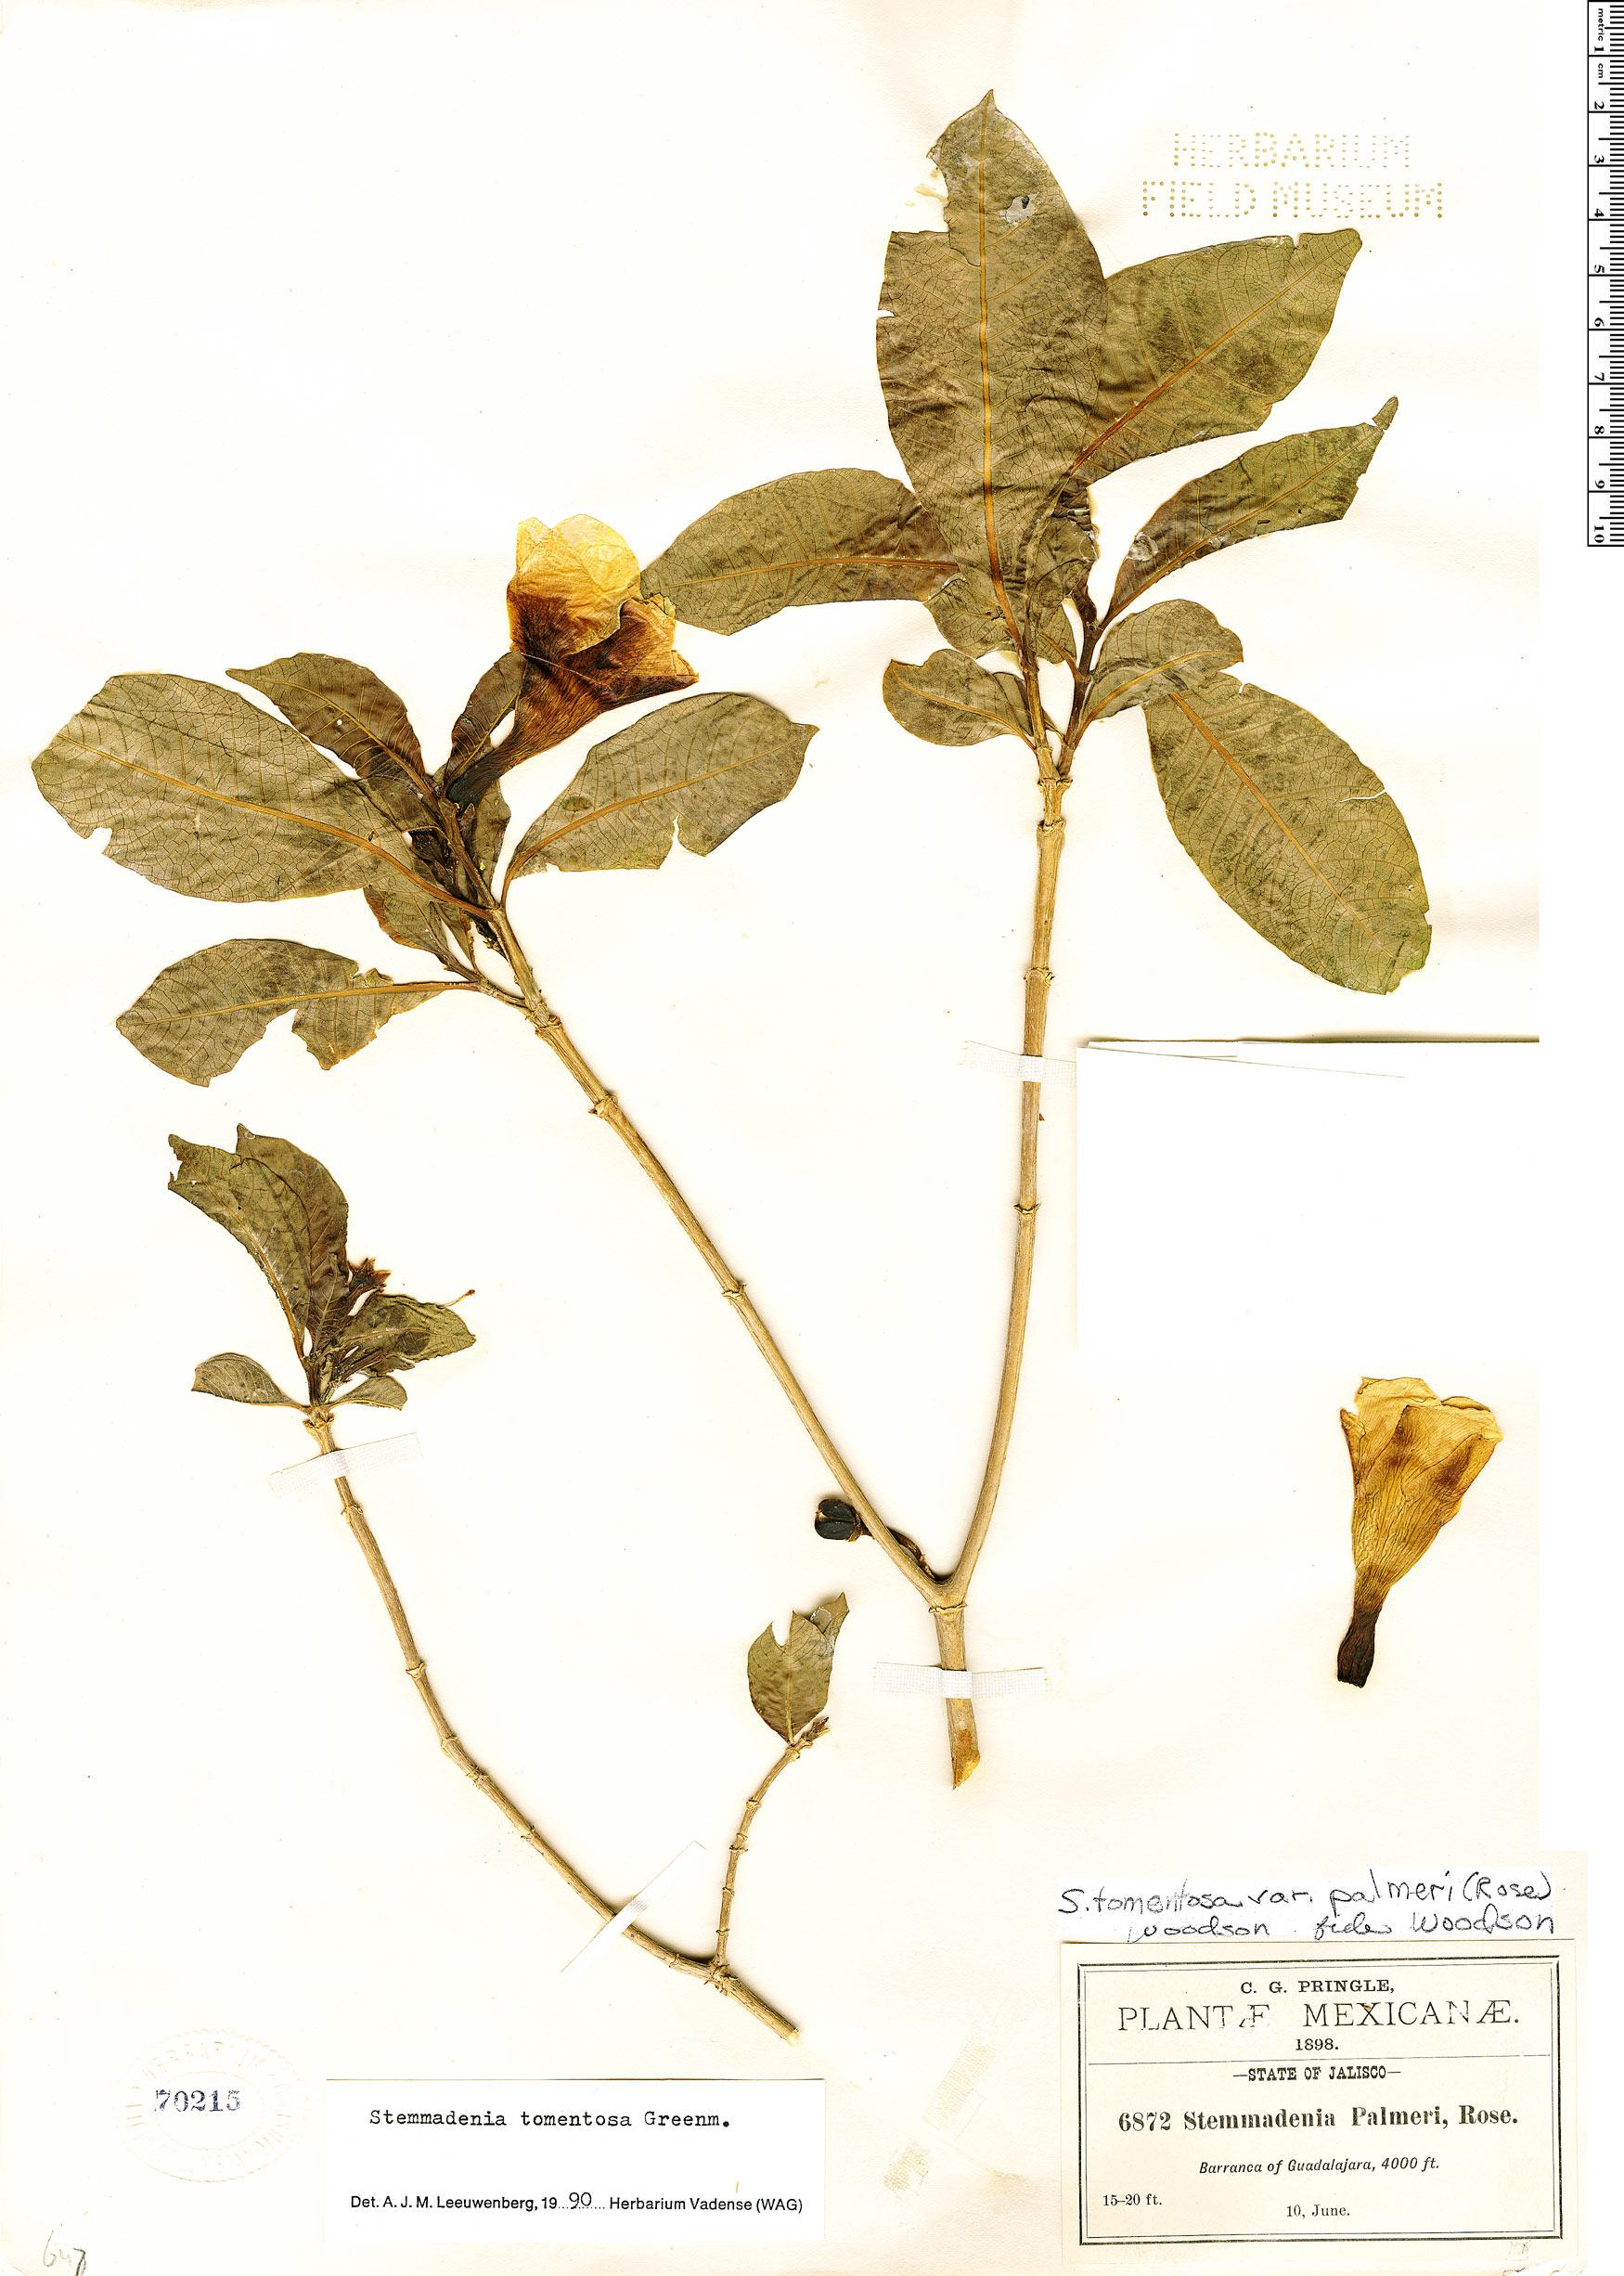 Specimen: Stemmadenia tomentosa